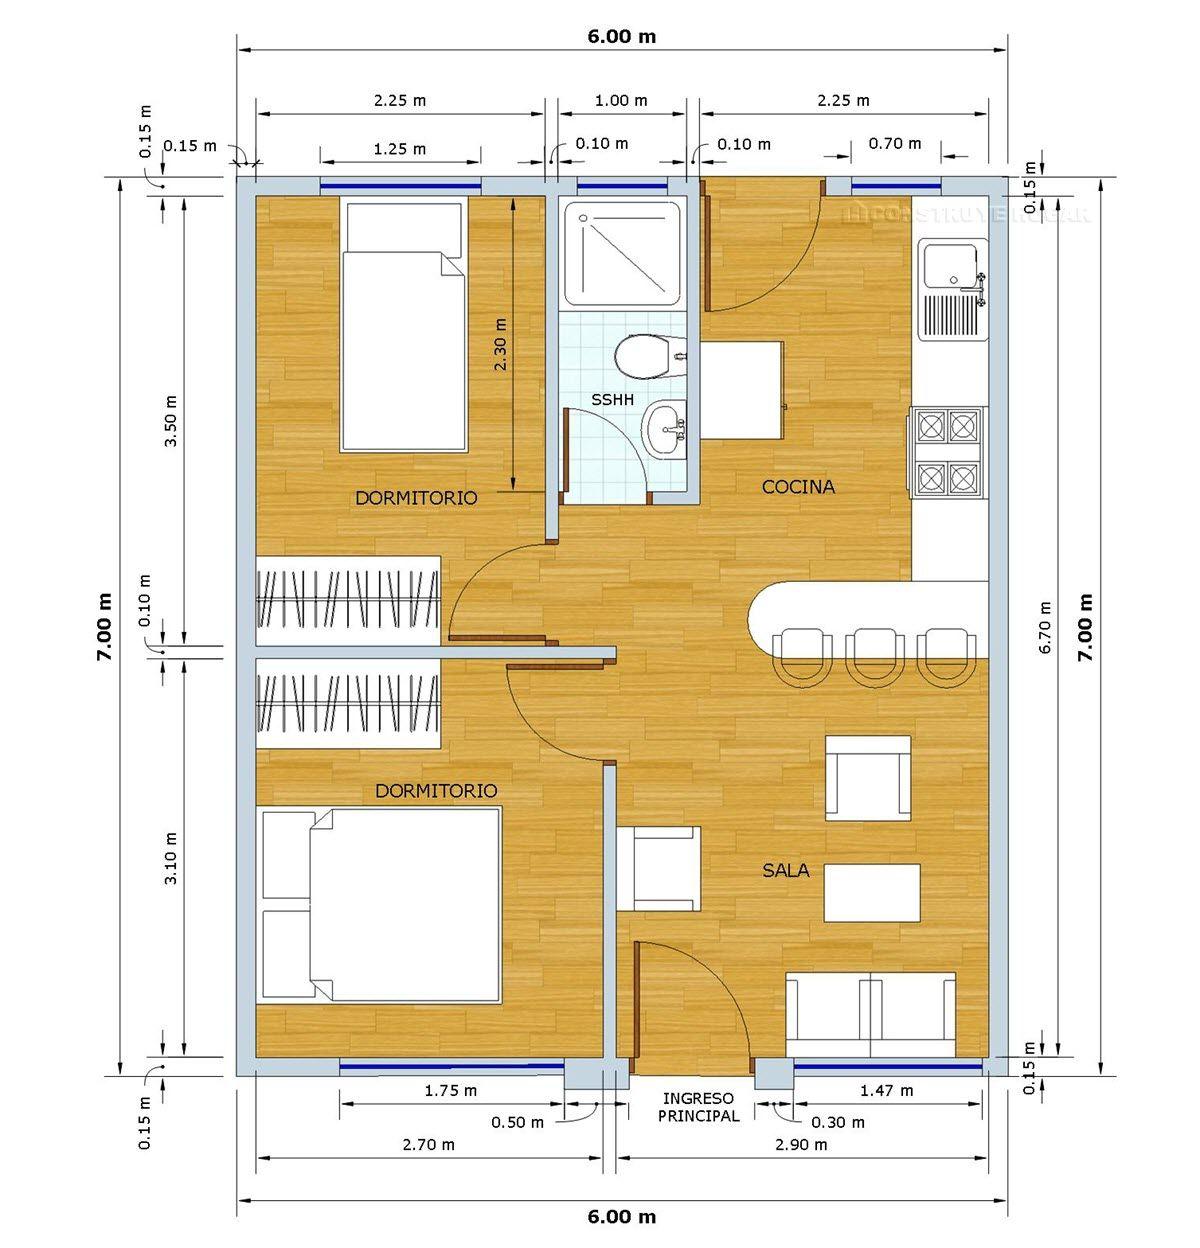 Planos de casa peque a de 42 metros cuadrados con moderna for Dormitorio 15 metros cuadrados